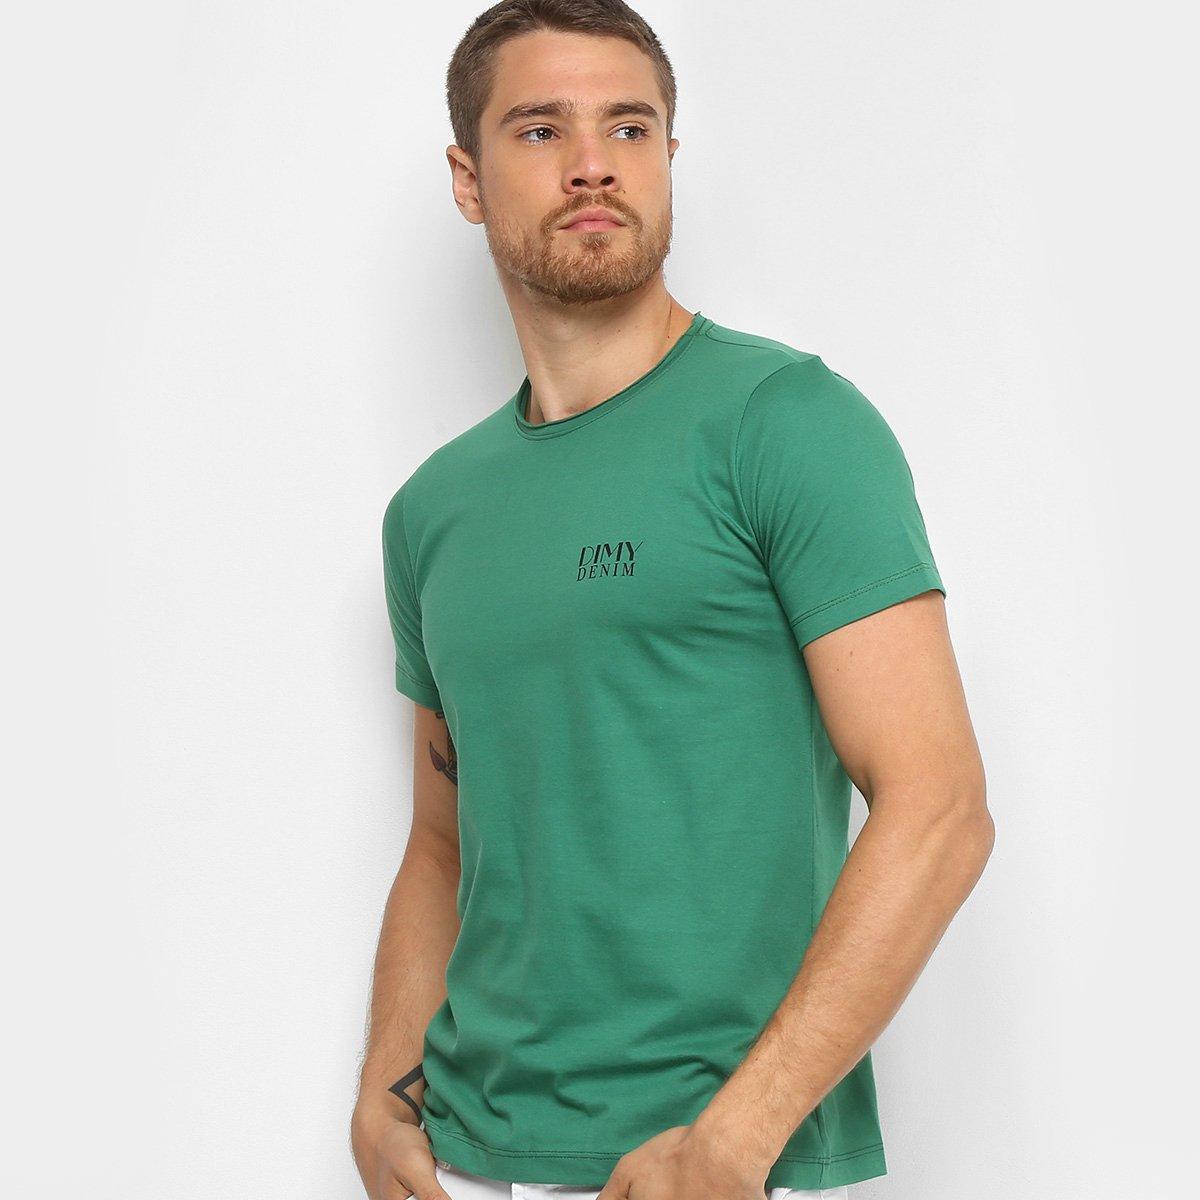 cc125418a Camiseta Dimy Clássica Masculina